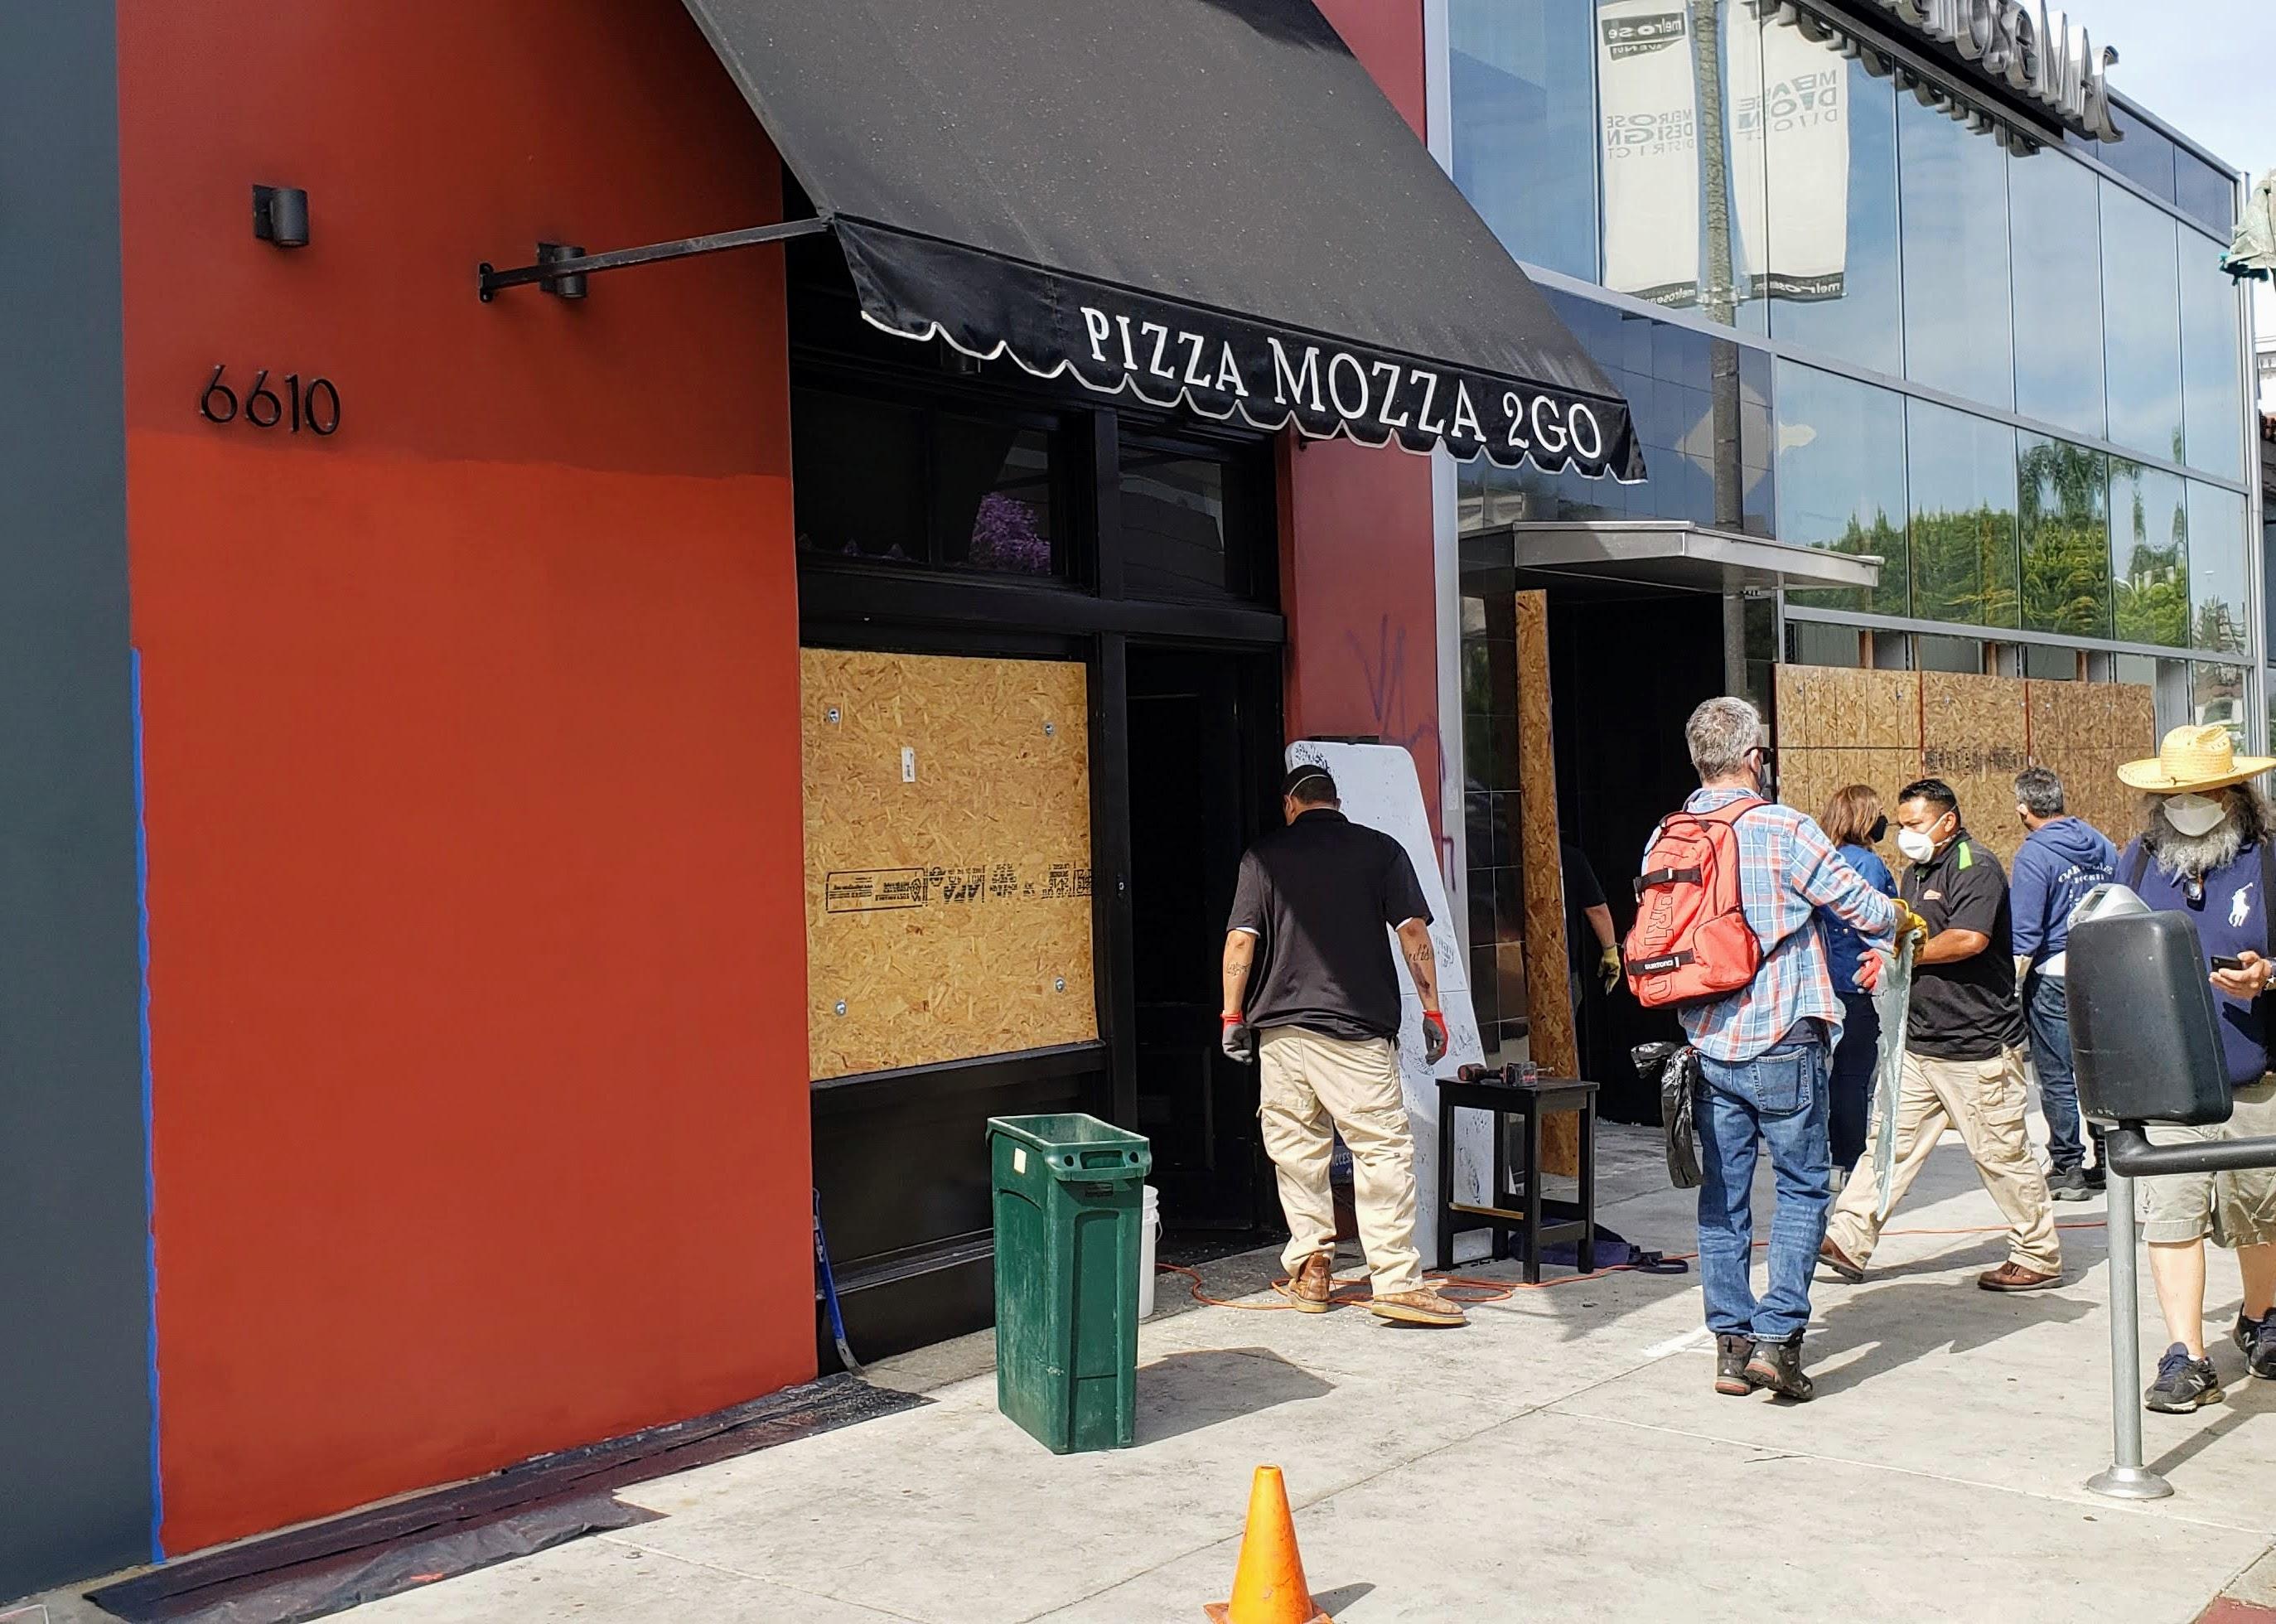 A burned facade for Los Angeles restaurant Mozza 2 Go